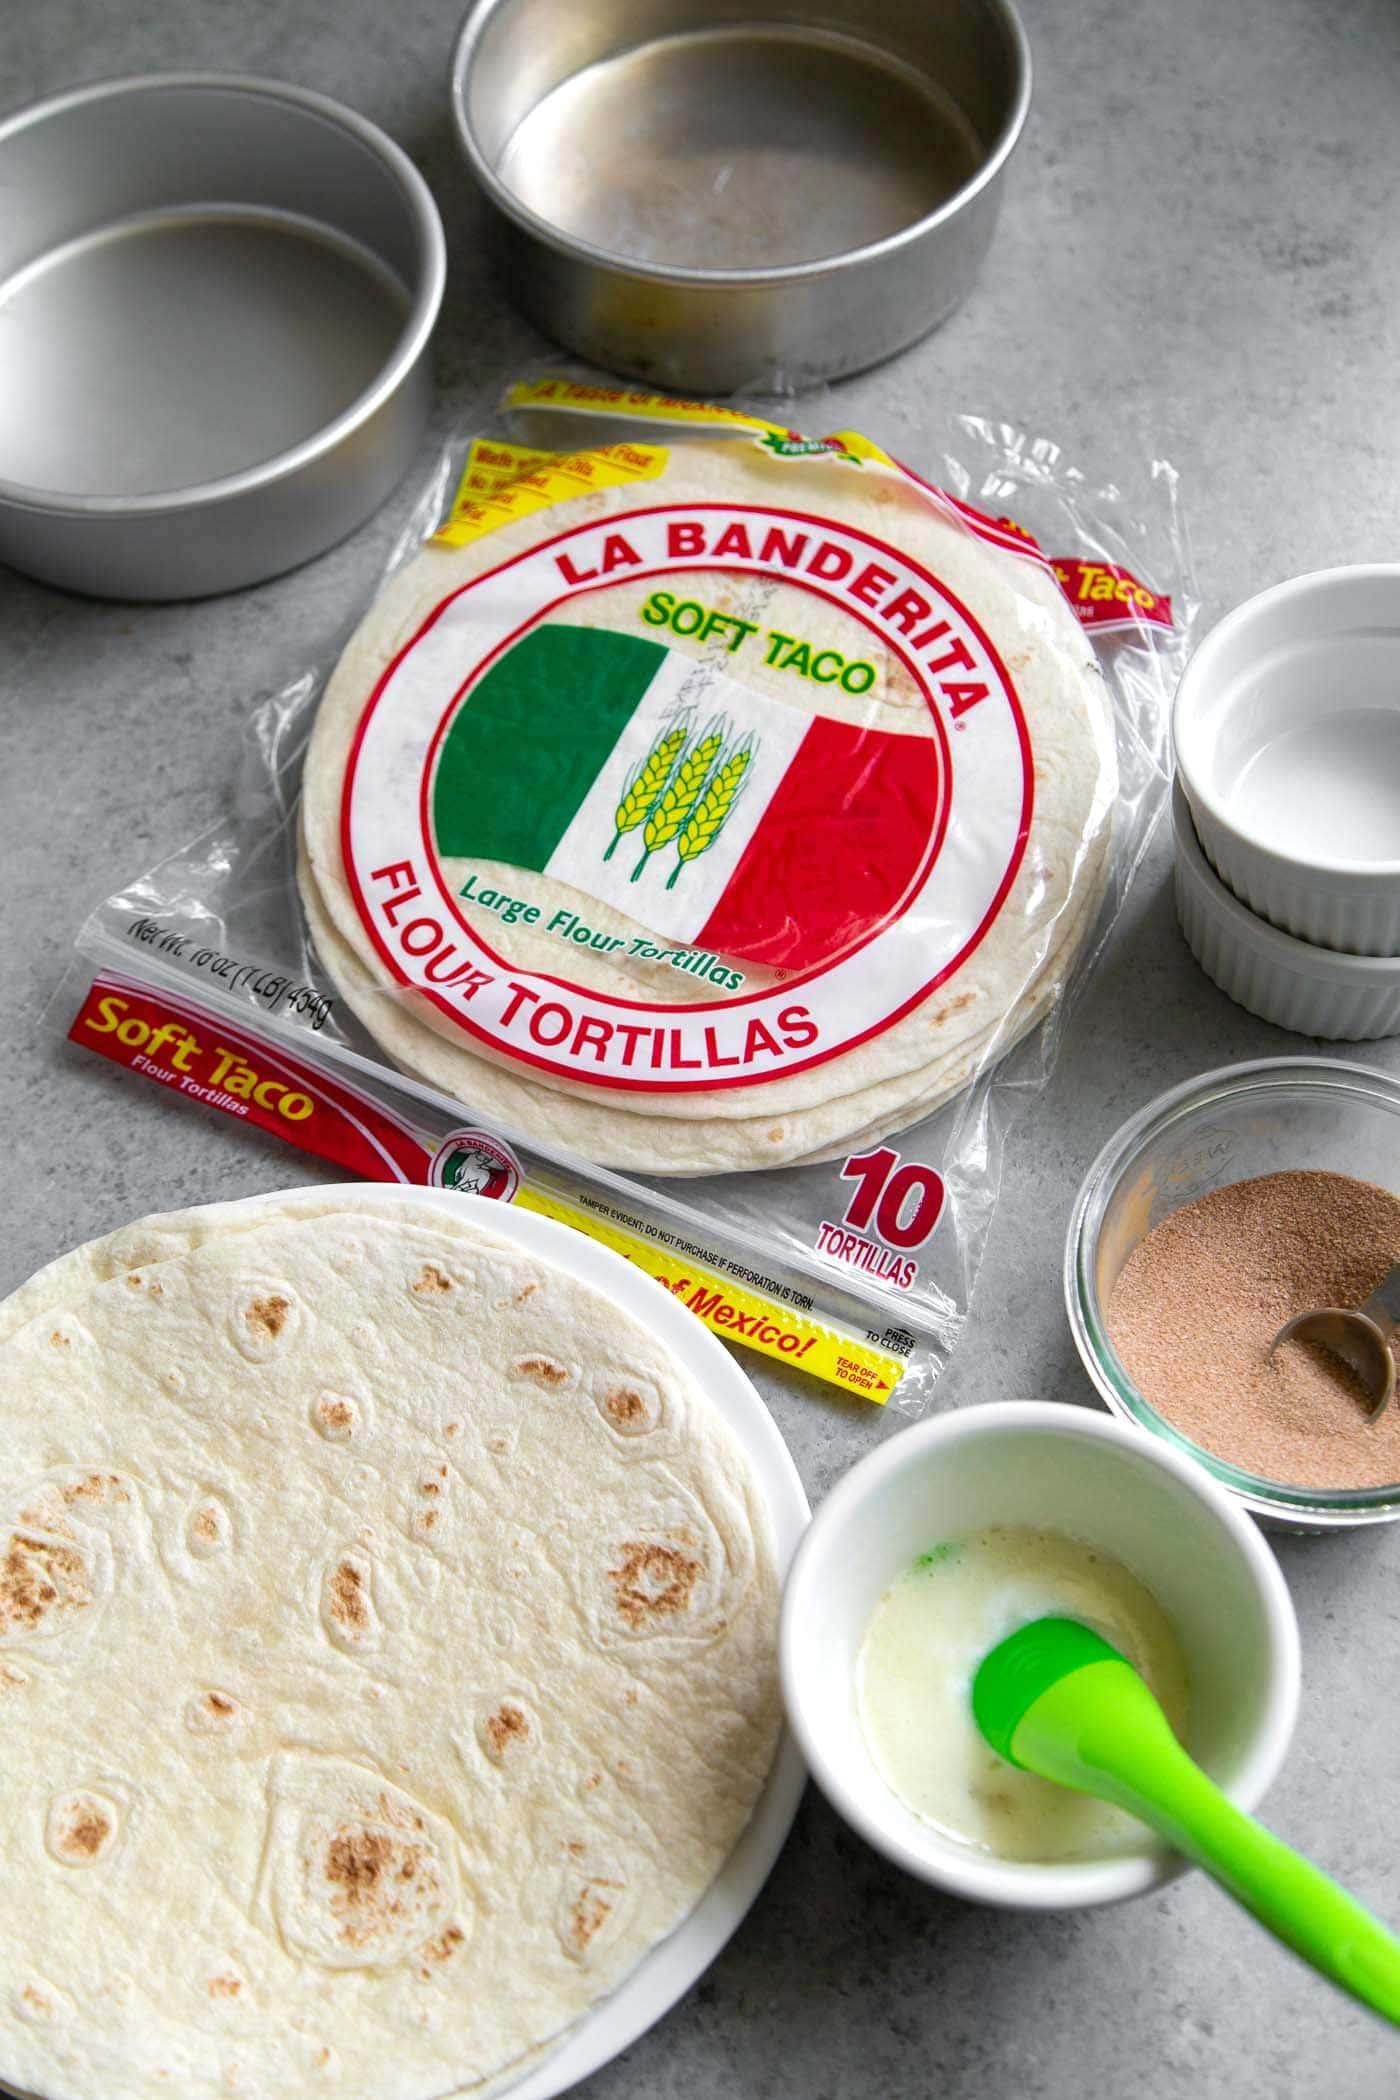 Baked Cinnamon Sugar Tortilla Bowl ingredients